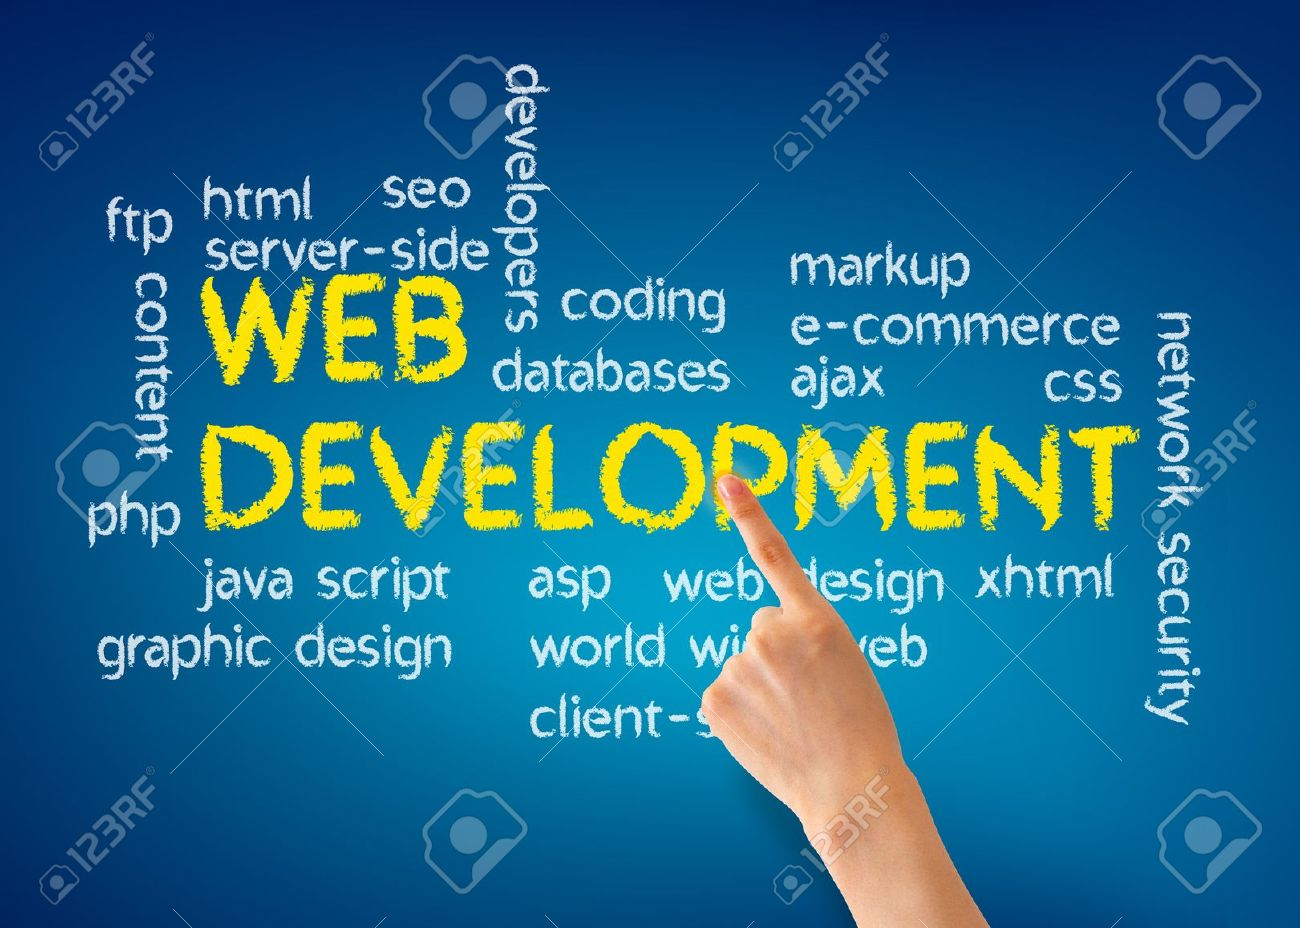 Background image xhtml - Jpg 1300x928 Website Programmer Background